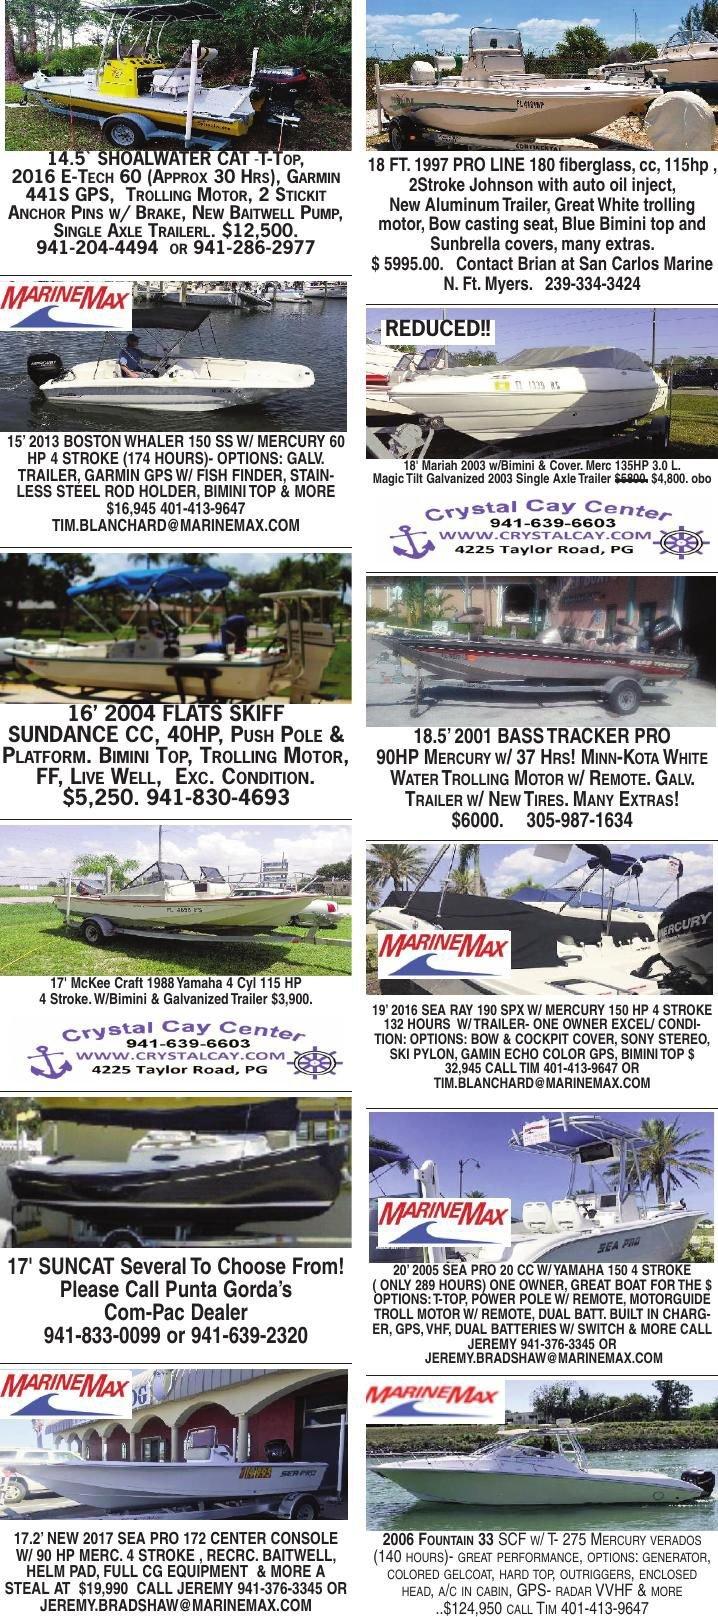 070518BoatsP1 | Waterline | yoursun com